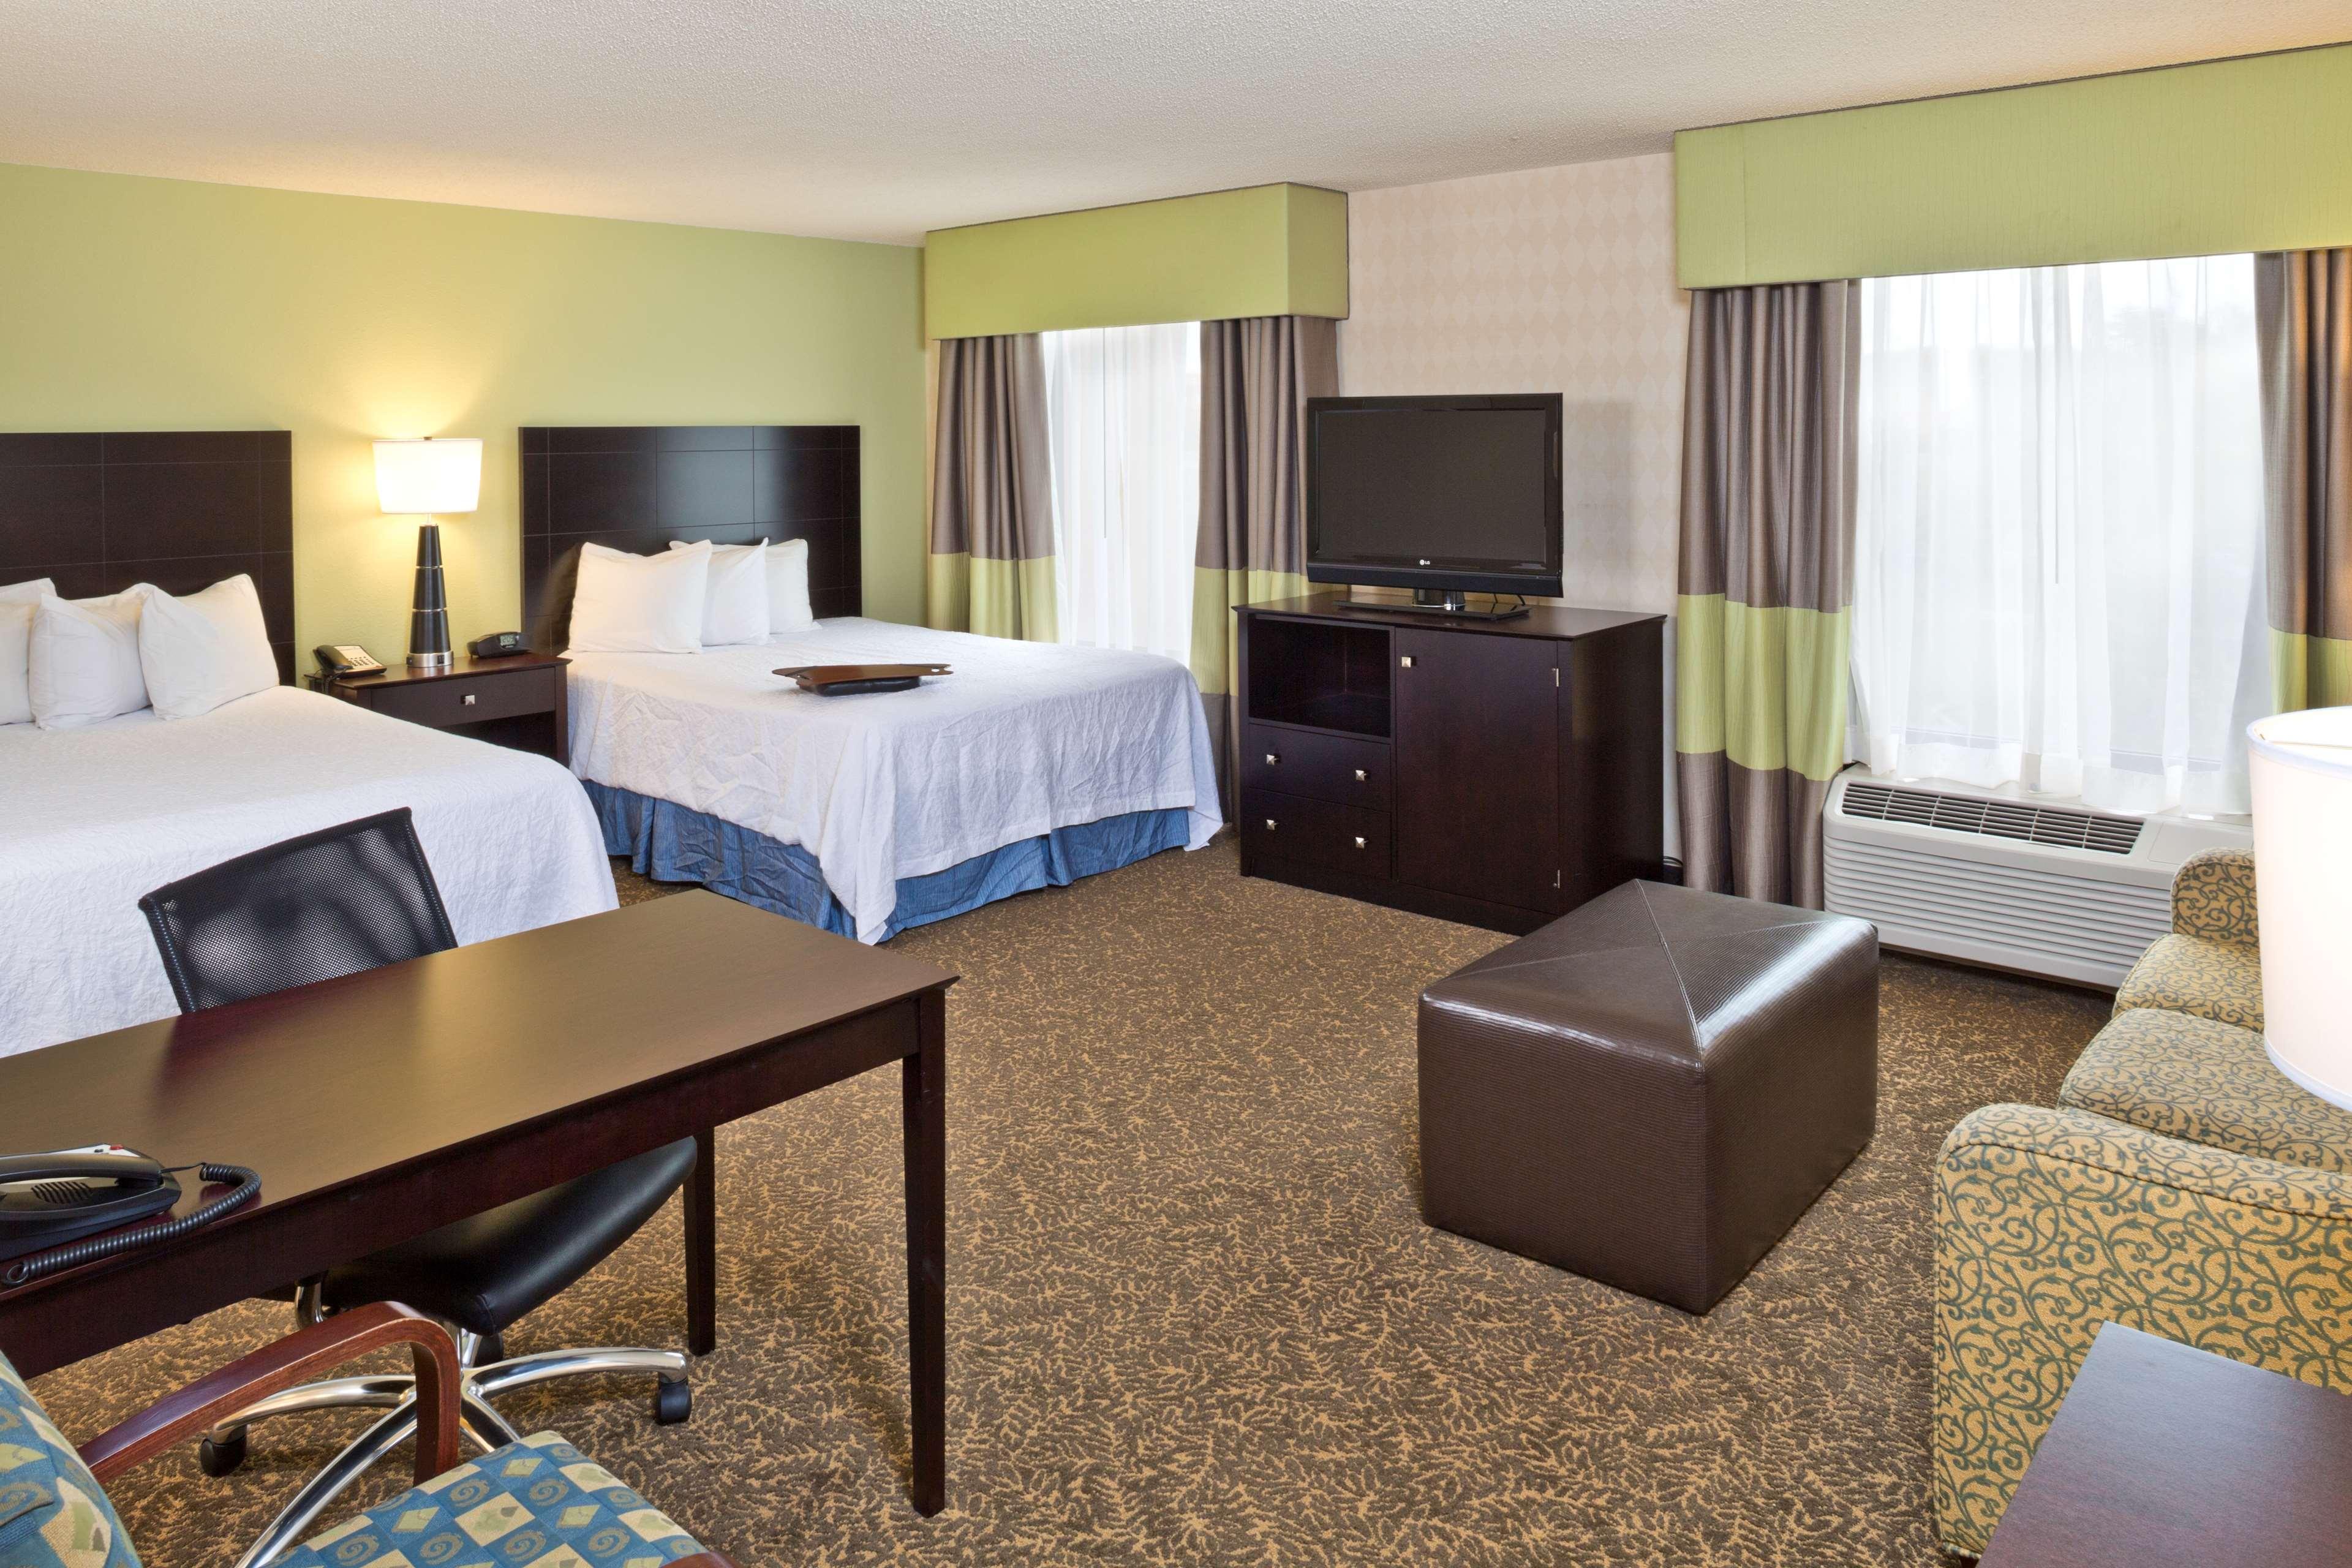 Hampton Inn & Suites Arundel Mills/Baltimore image 17